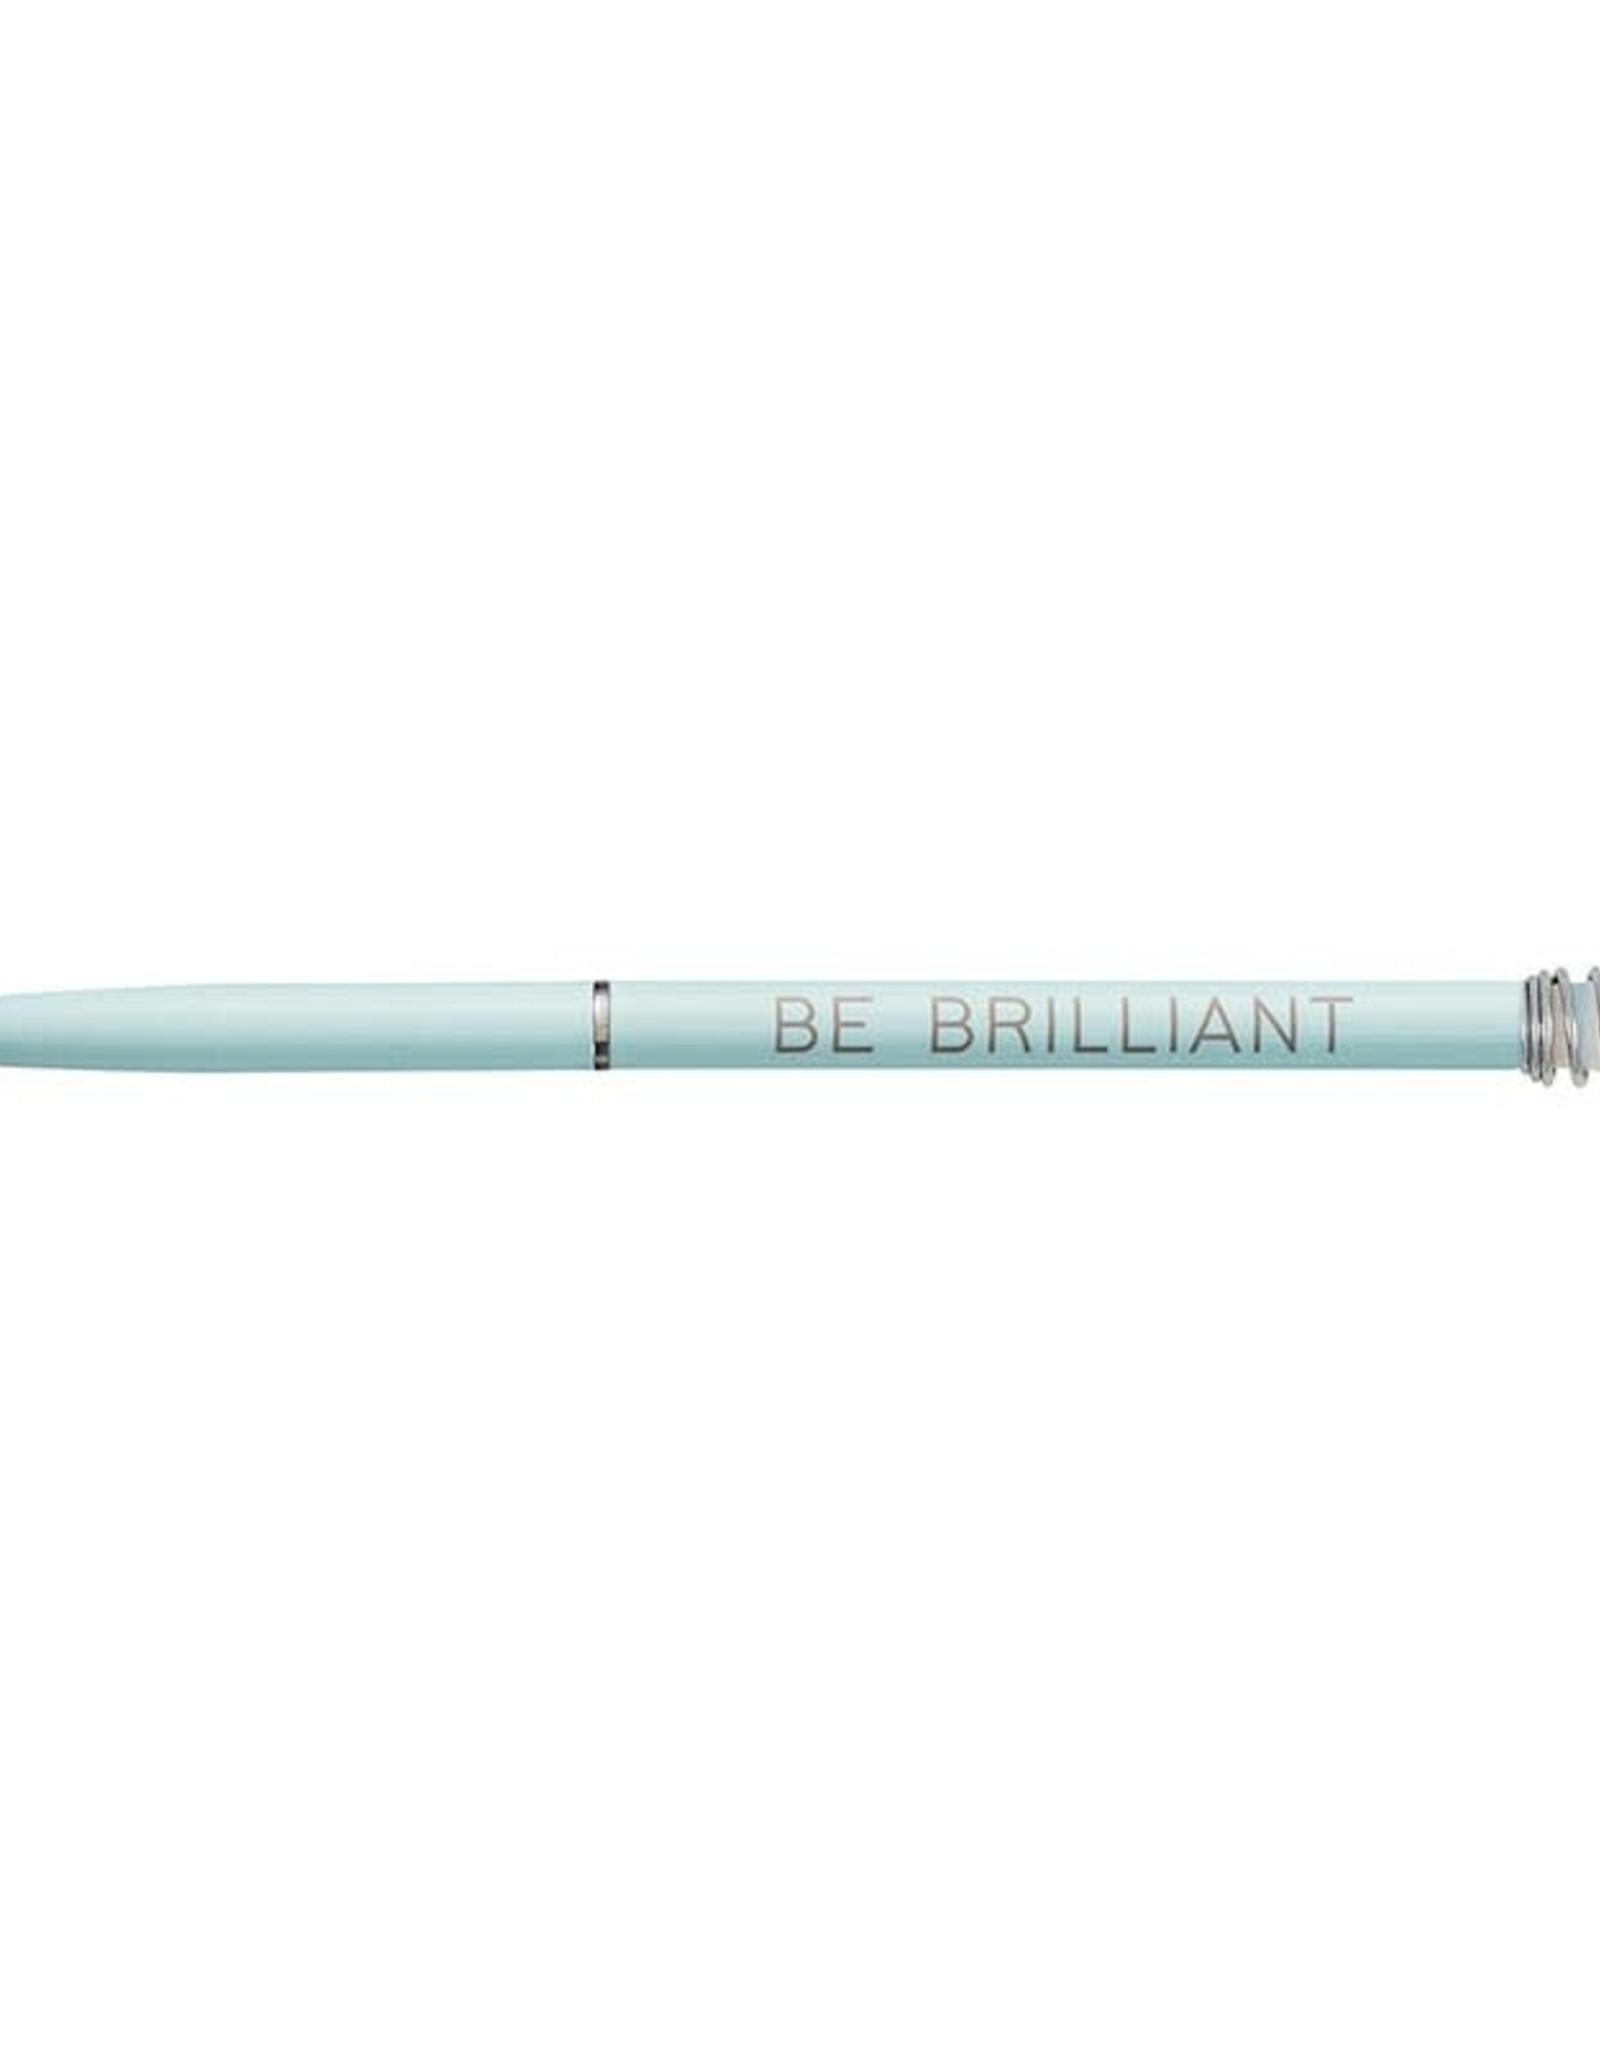 Santa Barbara Design Studio Pen Be Brilliant